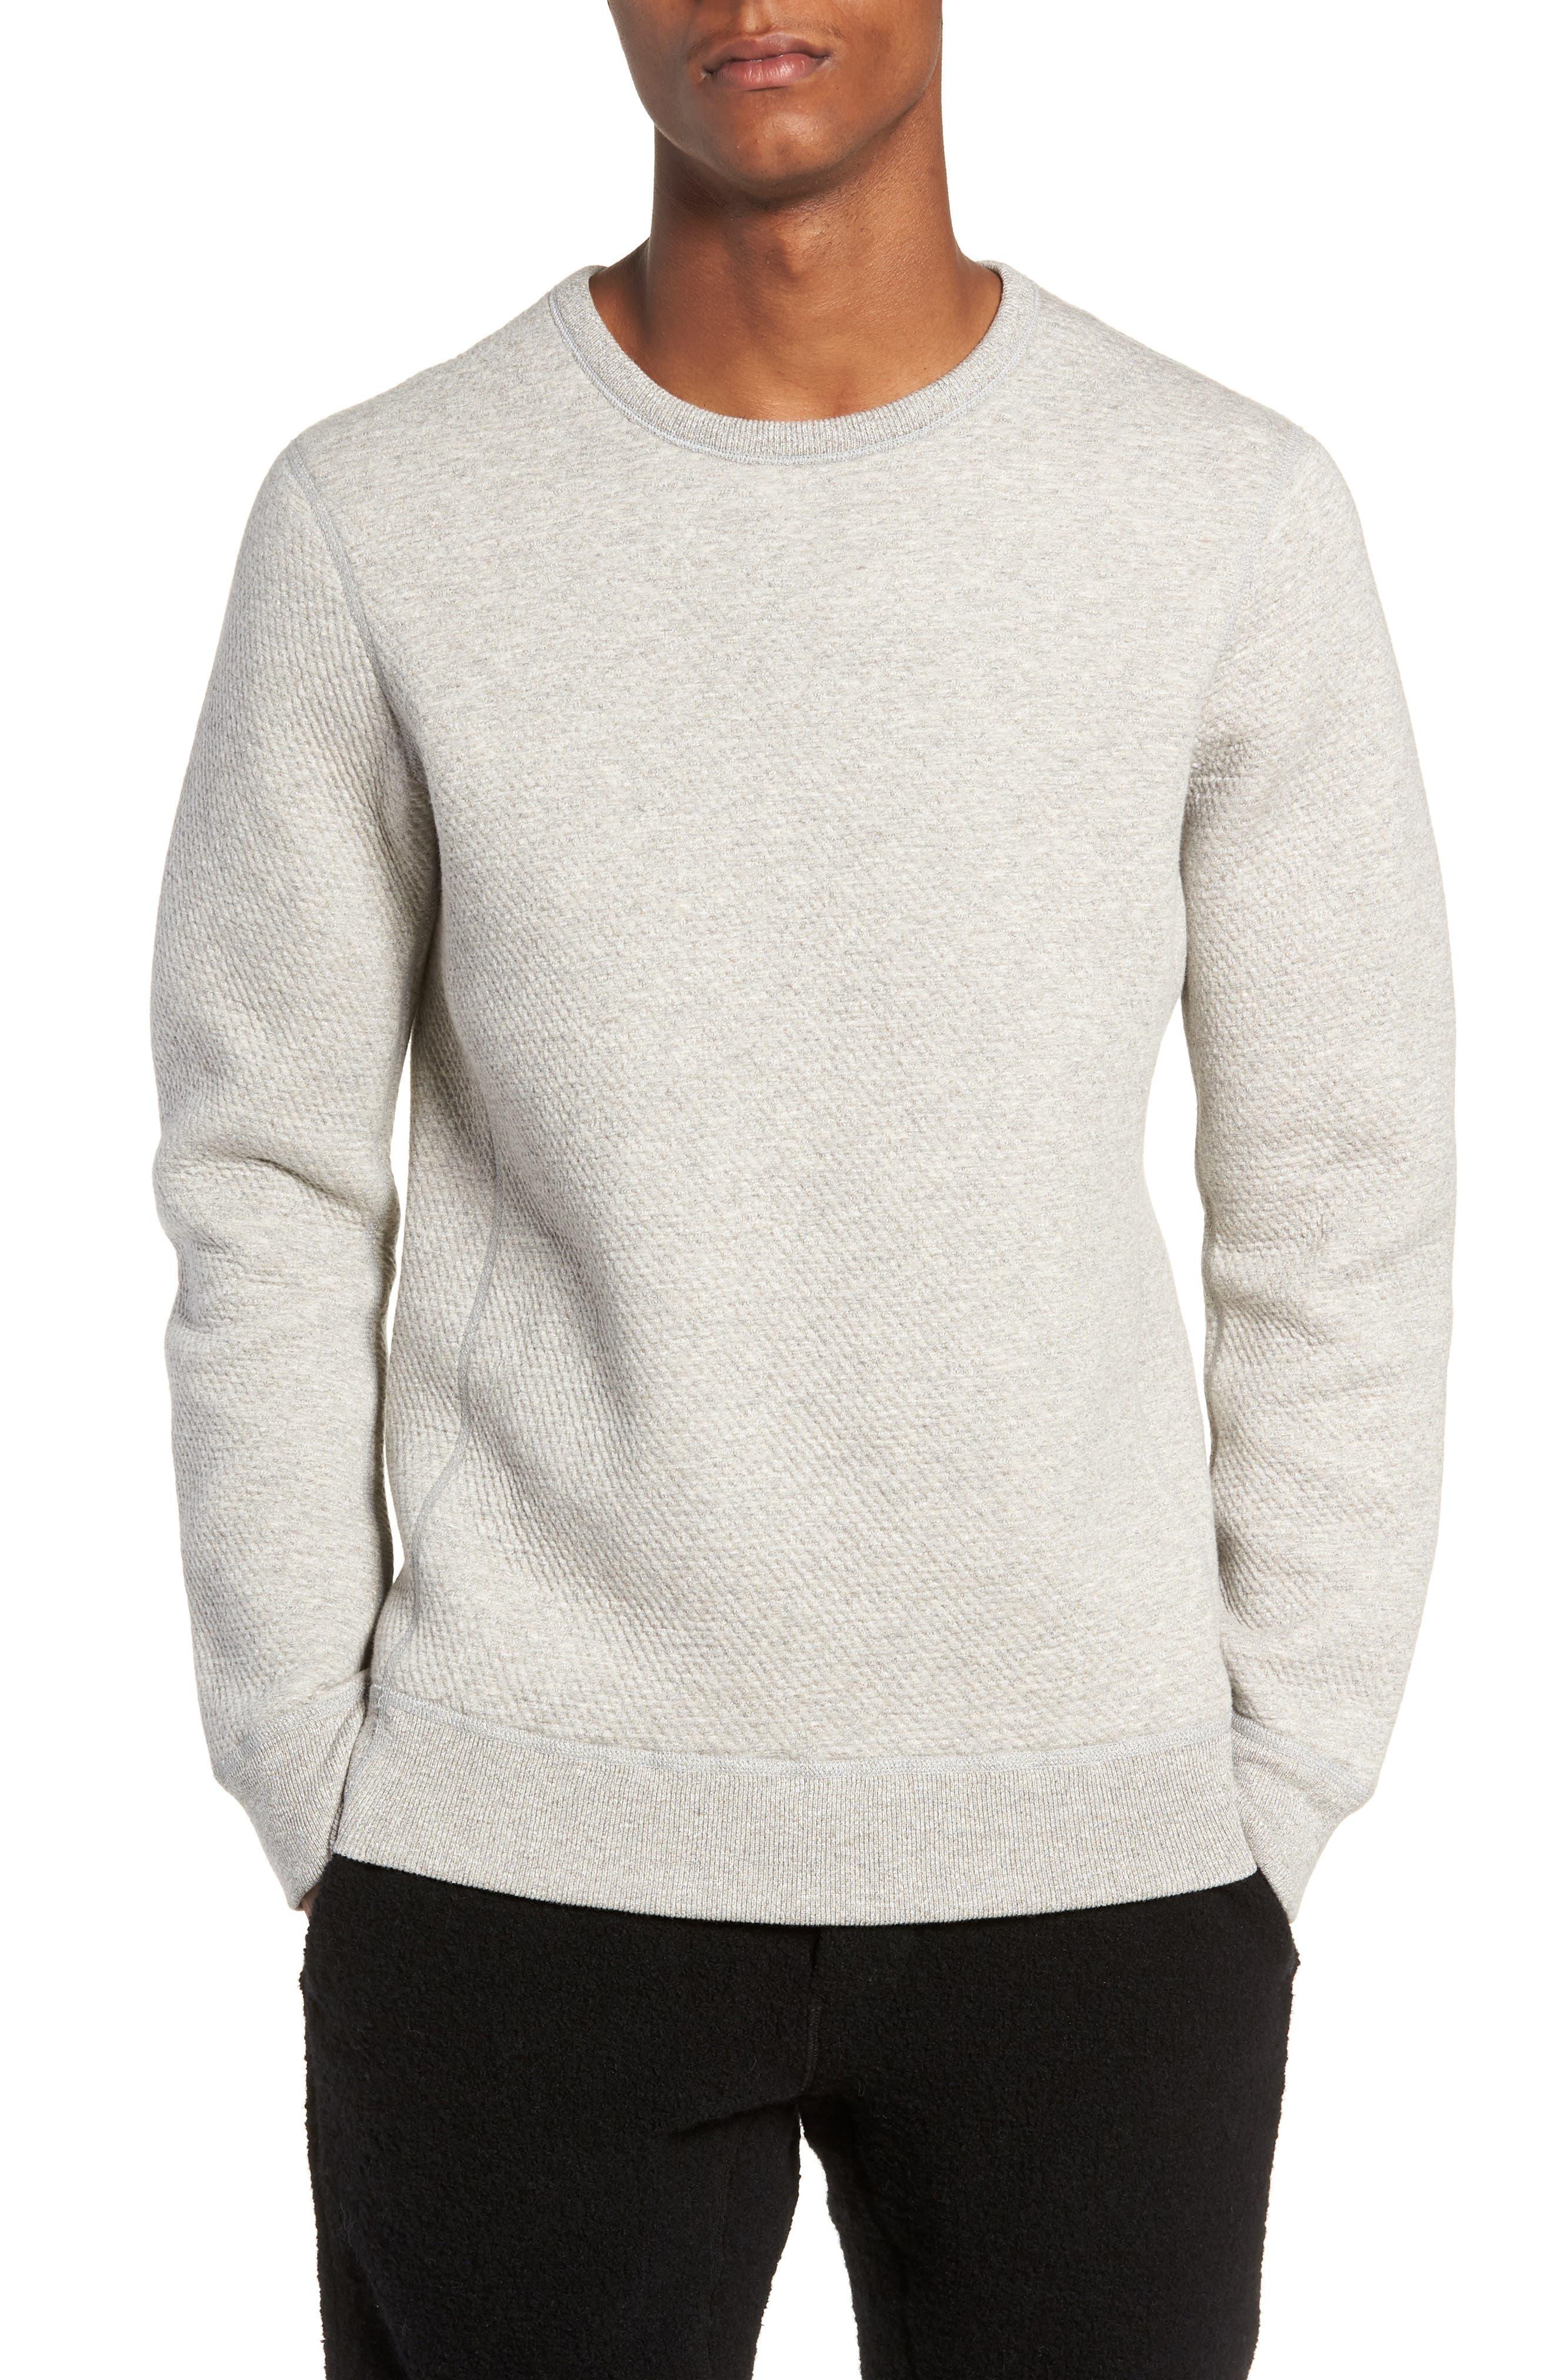 Cabin Fleece Sweatshirt,                             Main thumbnail 1, color,                             CONCRETE